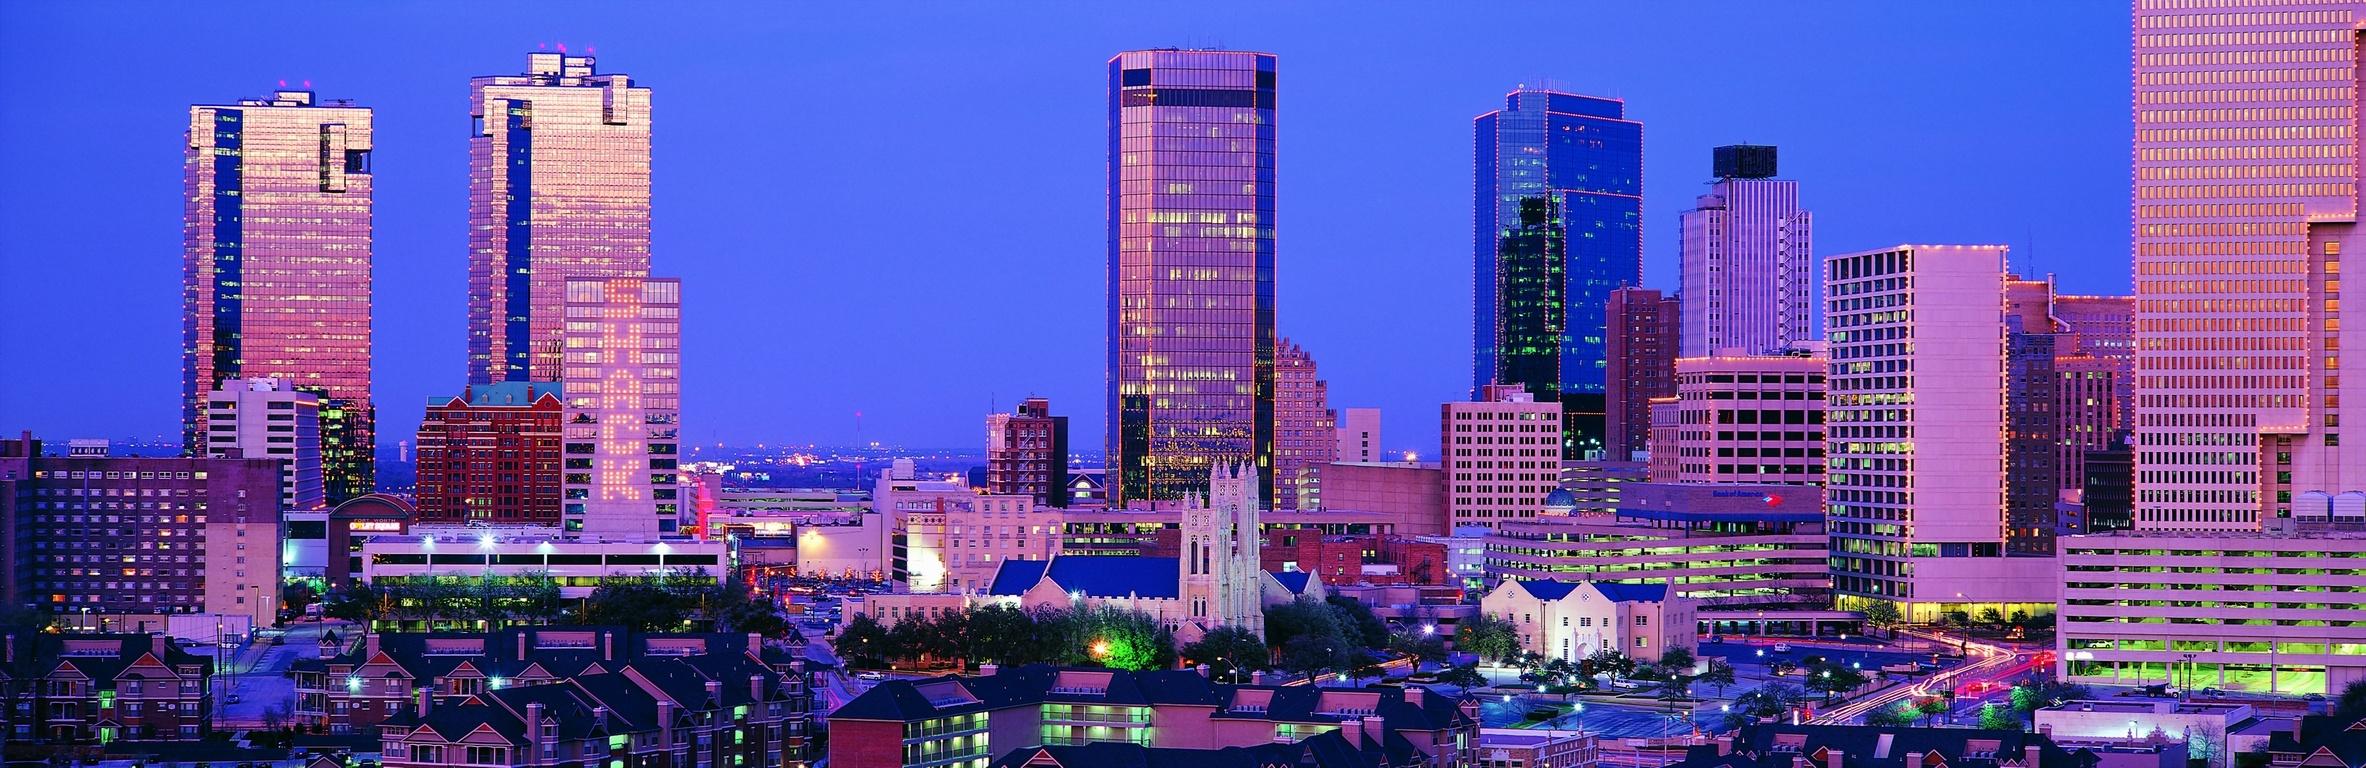 16 Cities of USA With Astonishing Night Views  Skylines